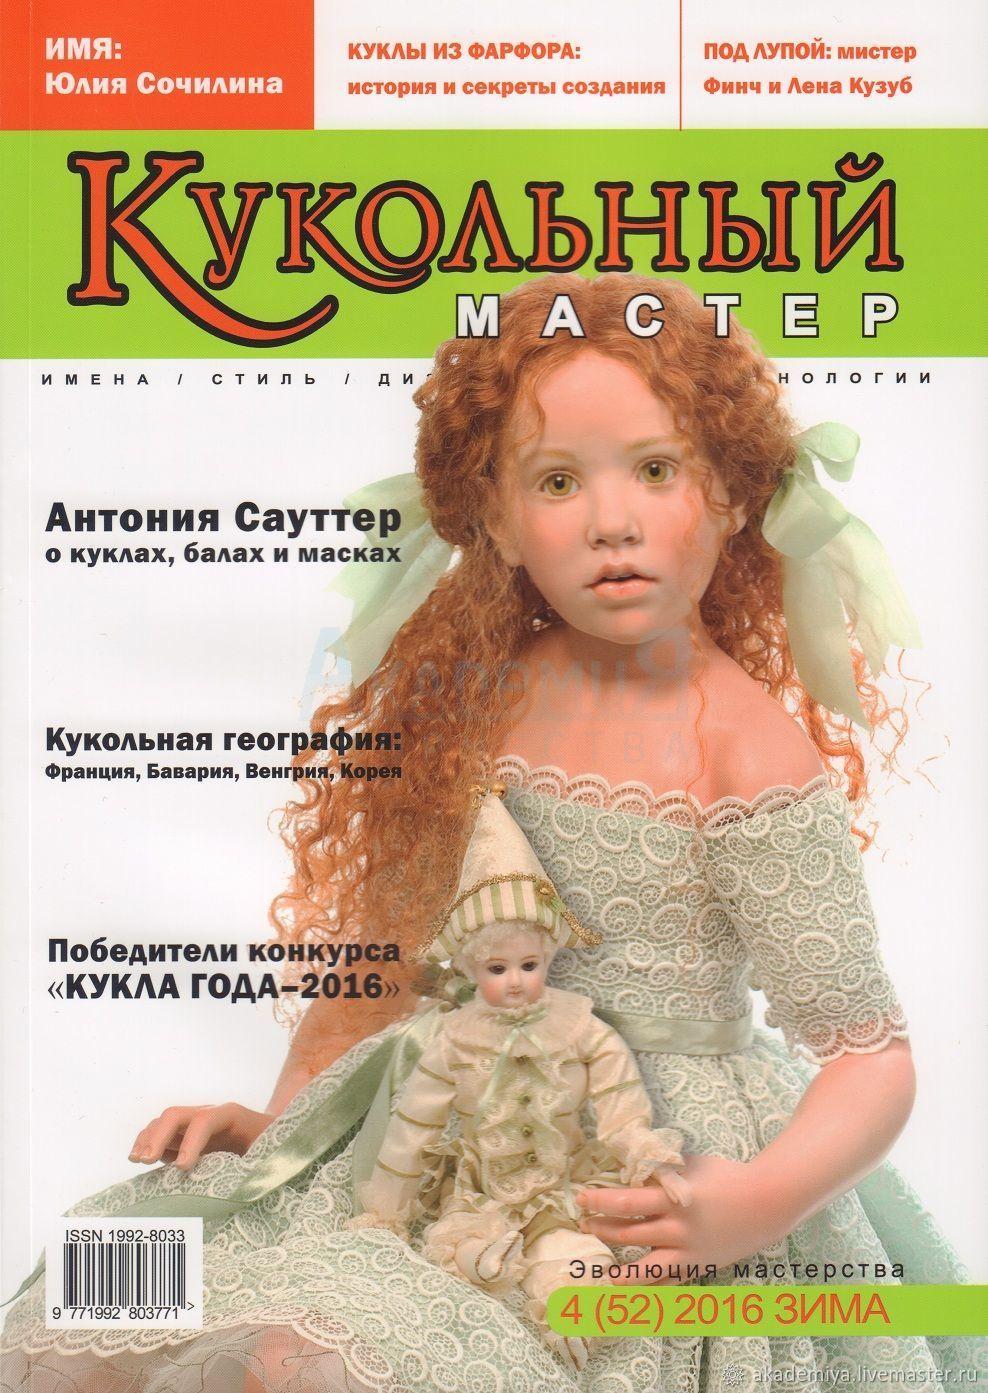 Журнал Кукольный Мастер 4(52) 2016 зима, Курсы и мастер-классы, Москва,  Фото №1